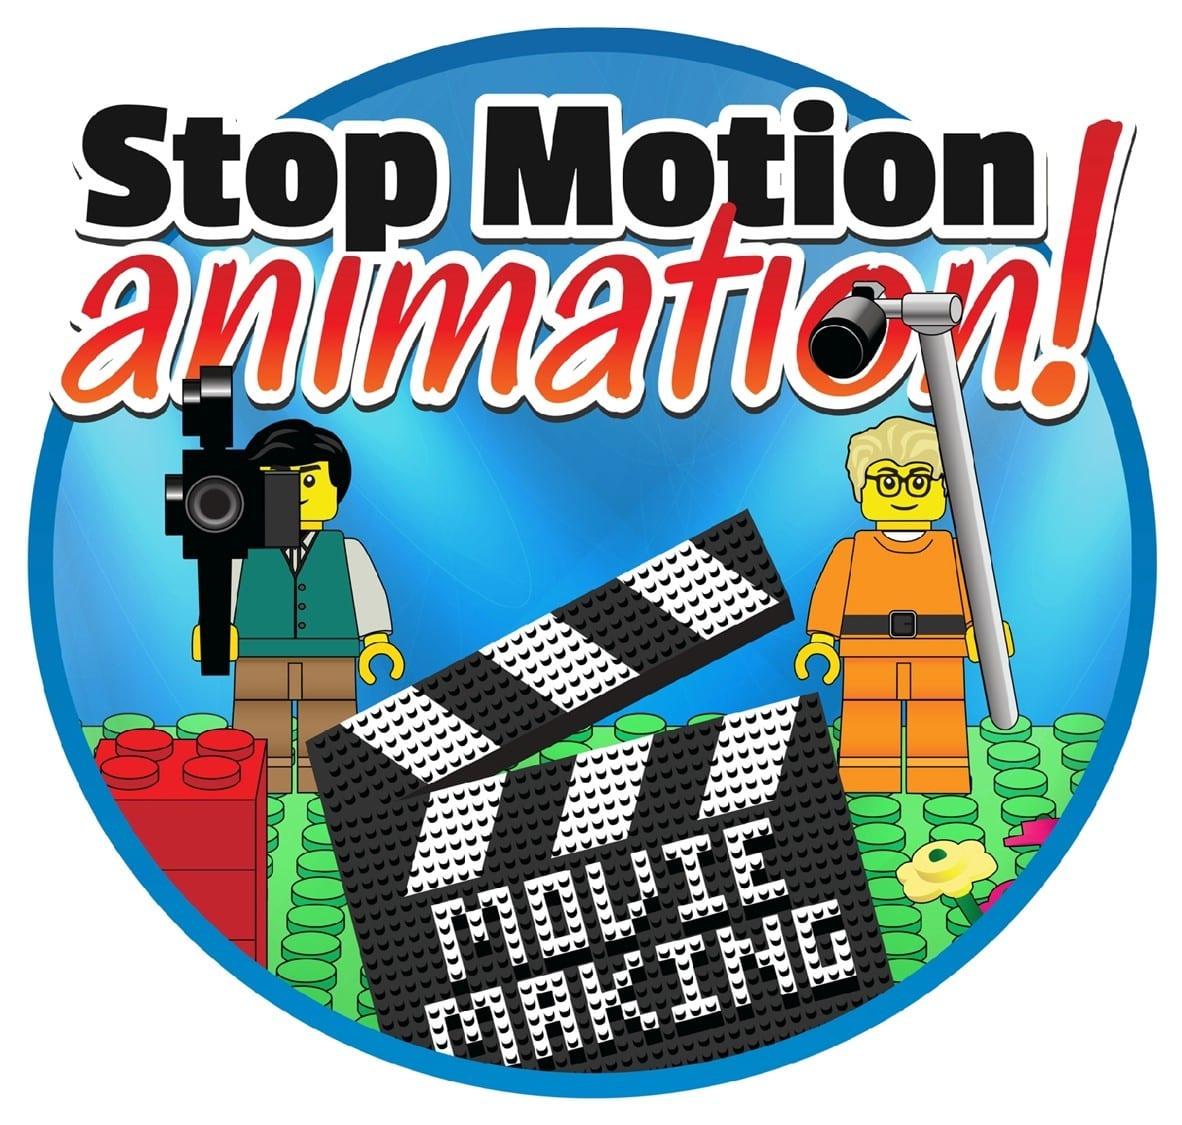 KS3 Stop Motion Animation Challenge